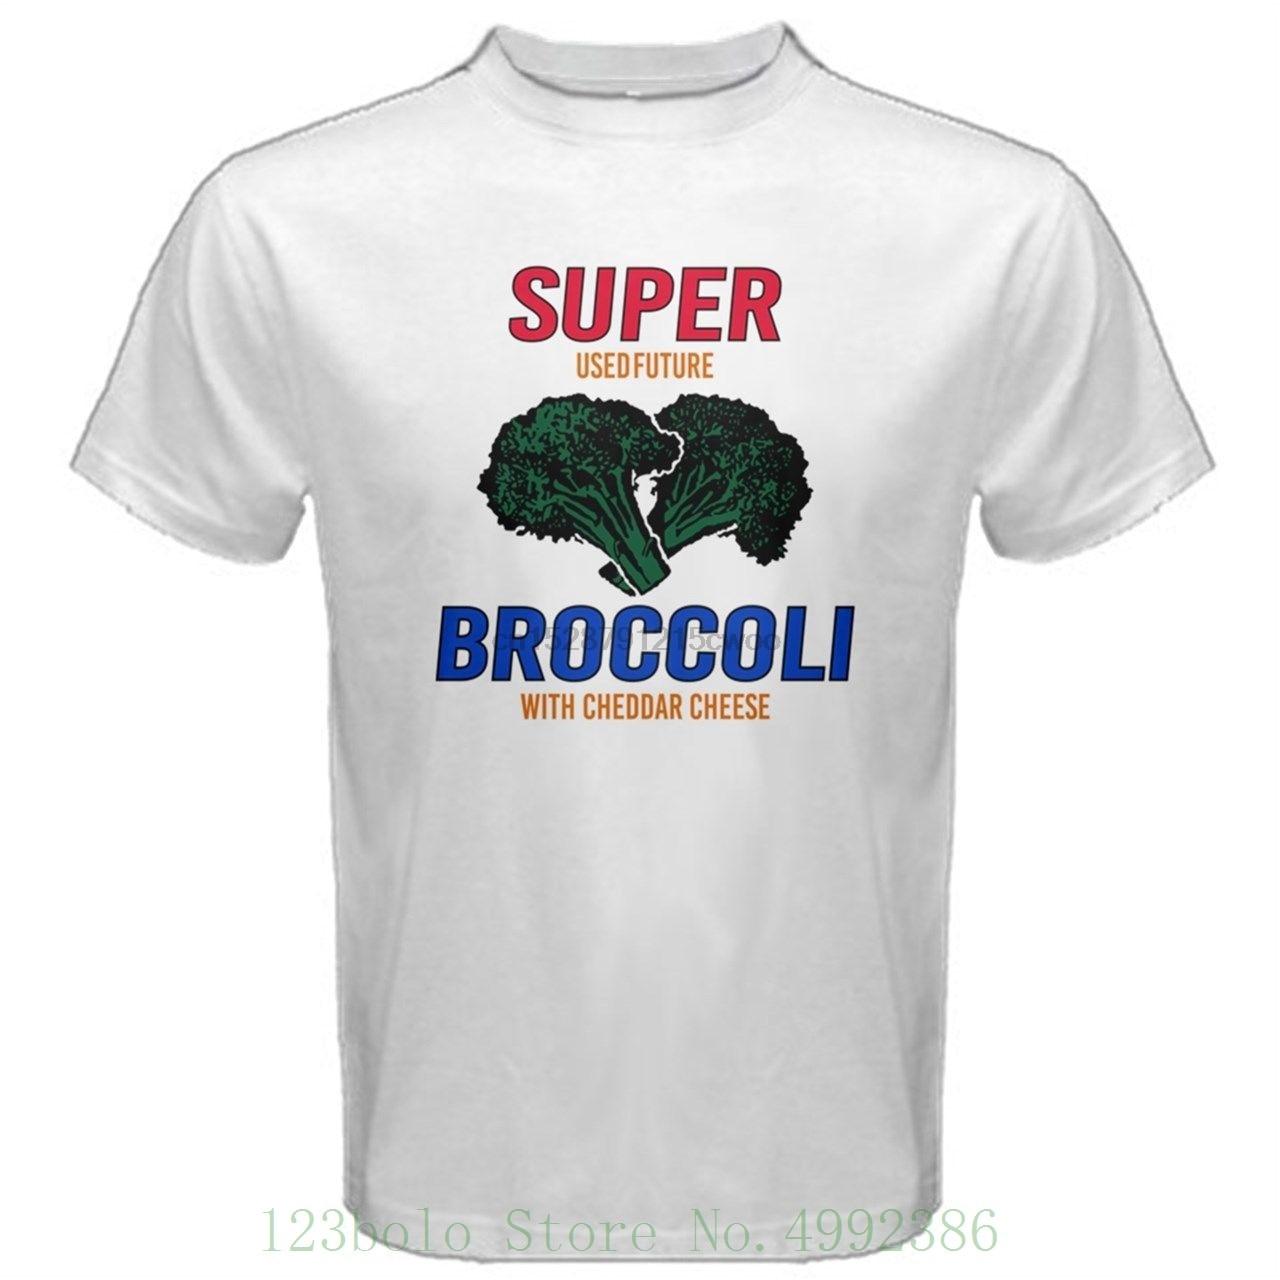 Kpop Nct 127 Super Broccoli 100% Cotton T-shirts Tees Johnny Funny Humour Sub1 Round Neck Teenage Pop Top Tee